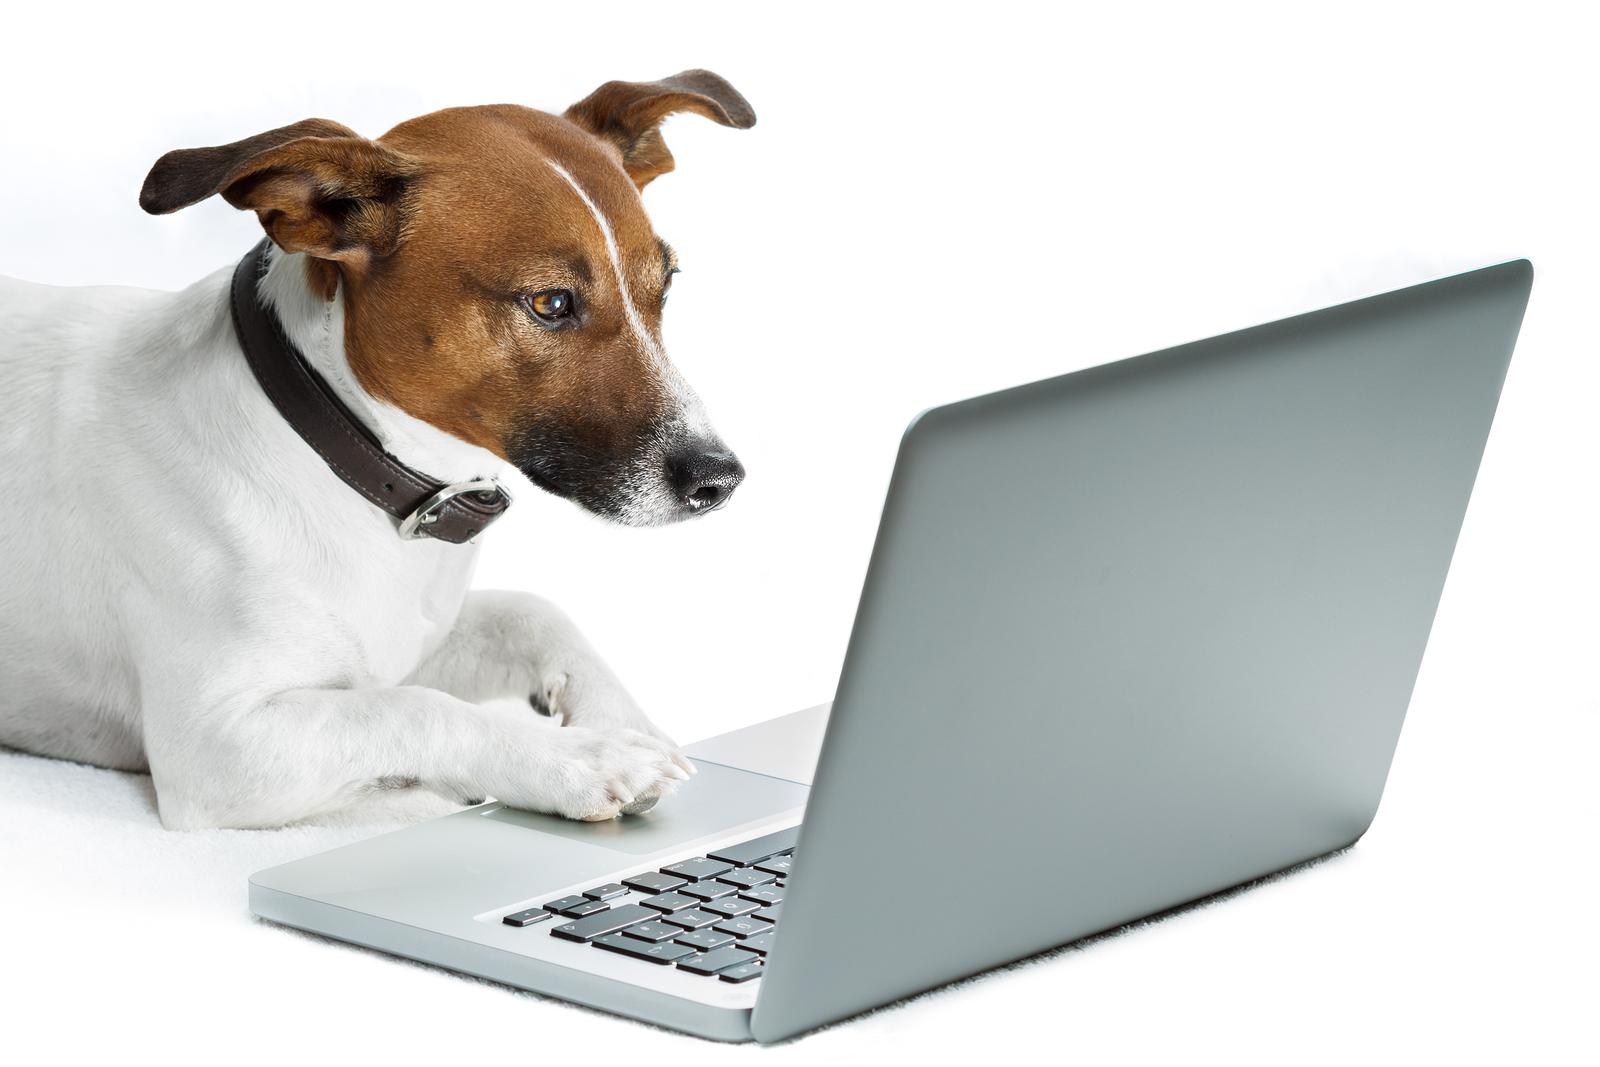 bigstock-Dog-Computer-33478682